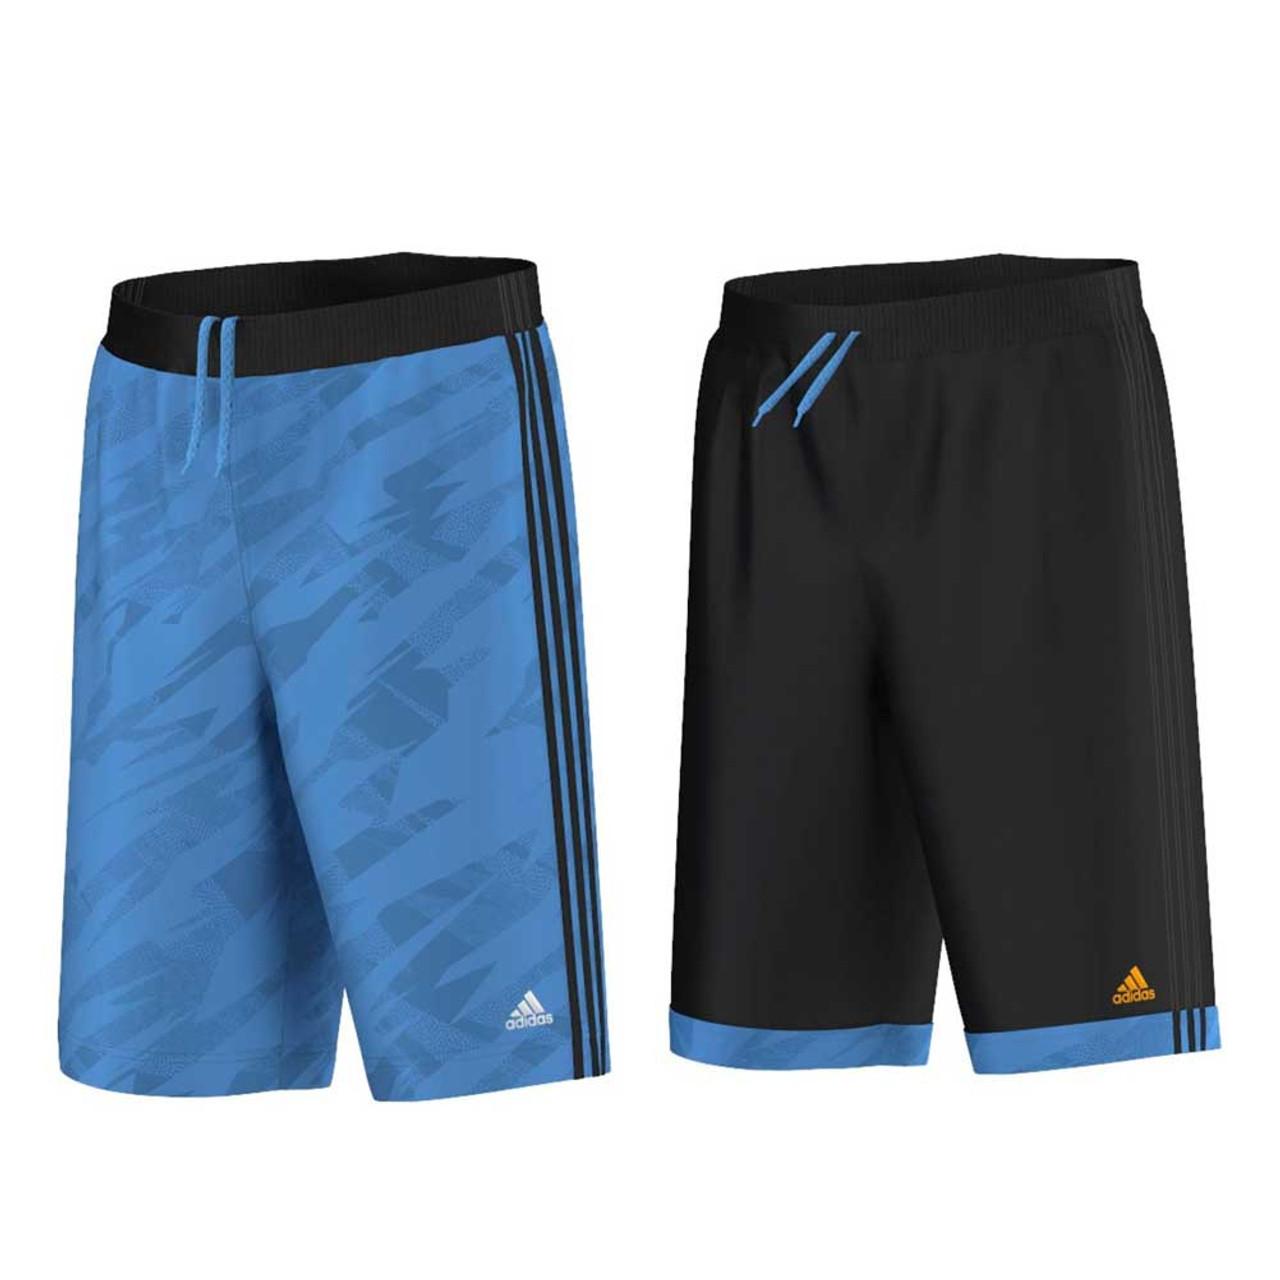 8b599b0c3428 ADIDAS reversible GFX basketball shorts [black/blue]